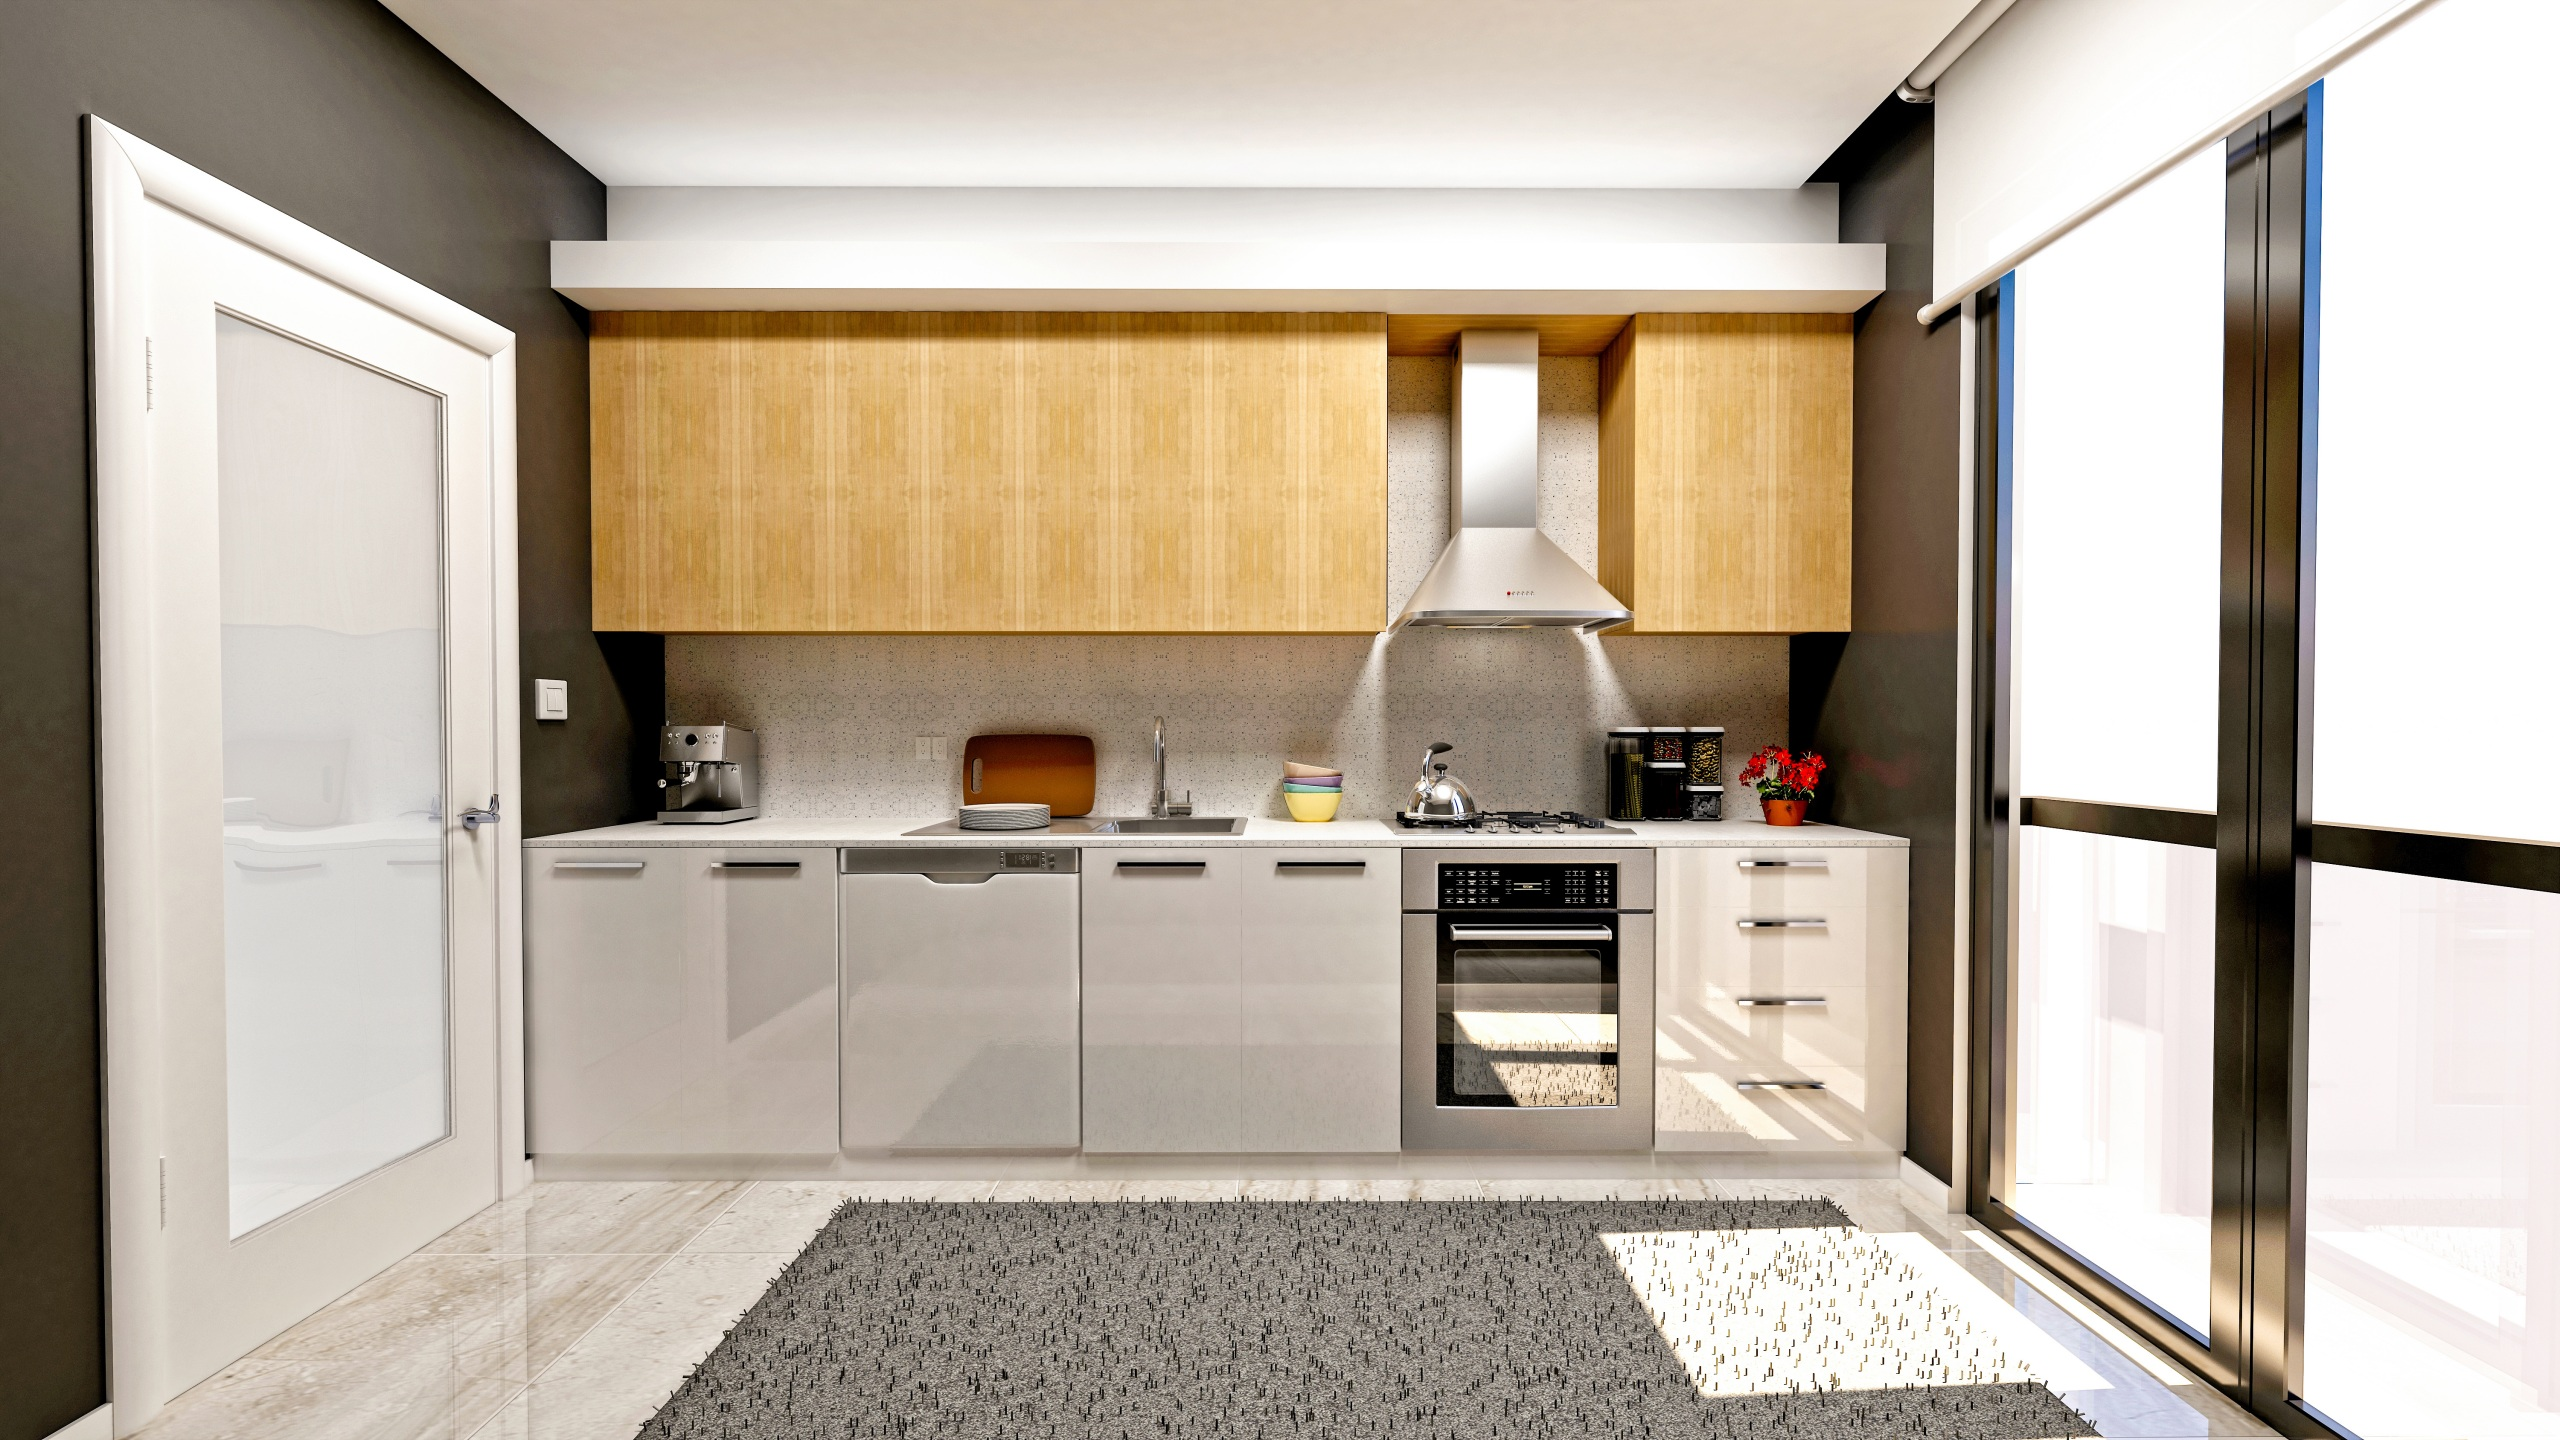 Fondos de Pantalla 2560x1440 Diseño interior Diseño Cocina ...